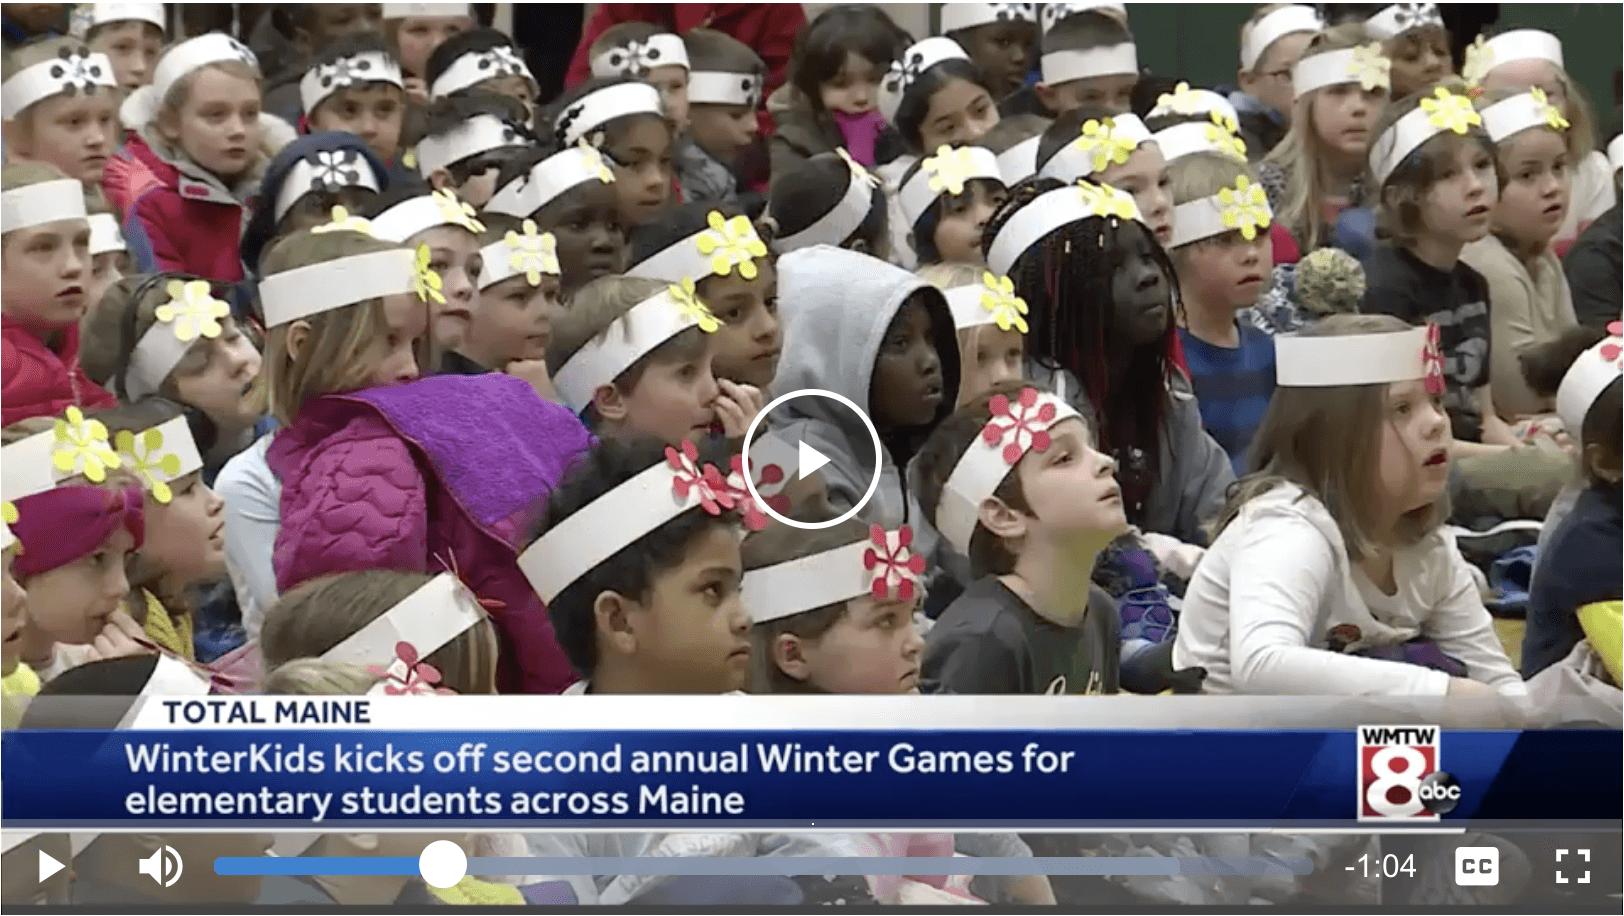 WinterKids Winter Games kicks off for elementary schools across Maine